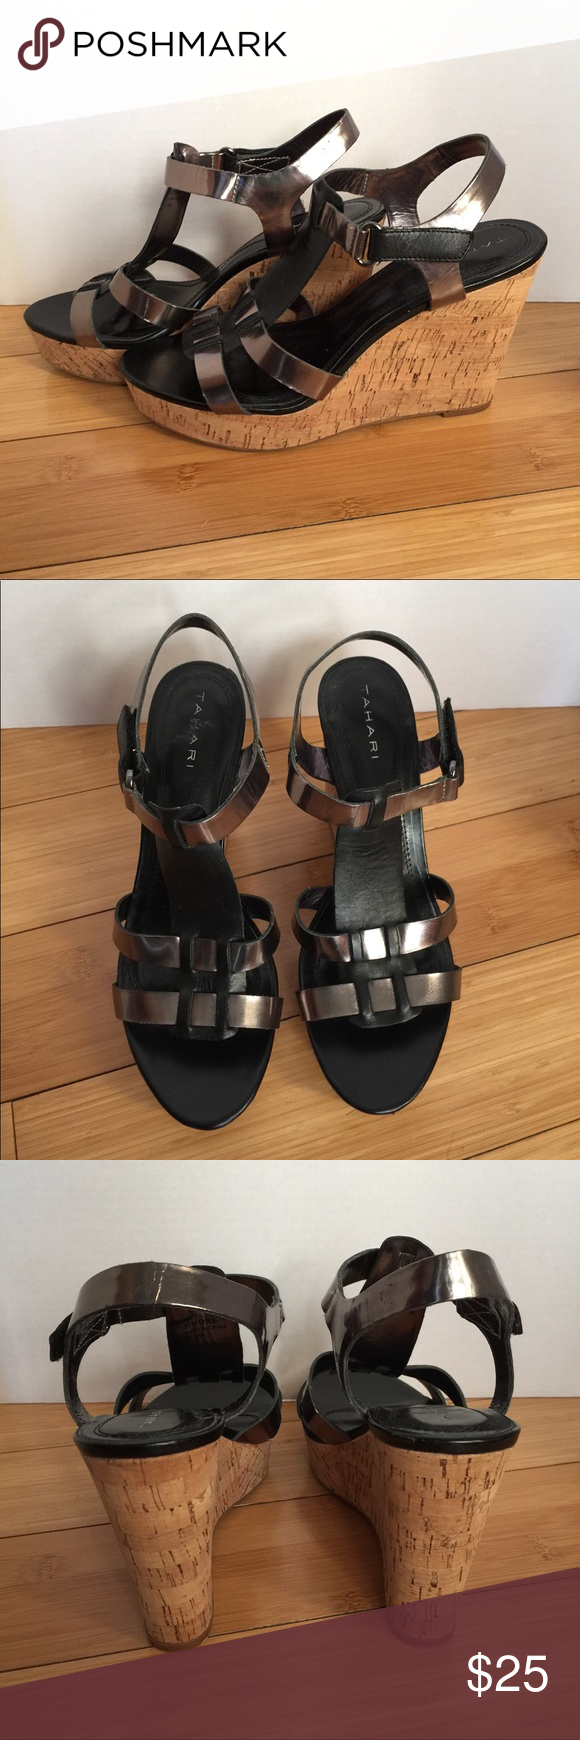 "Tahari black & pewter platform cork wedge sandals Tahari platform cork wedge sandals - Simone -Pewter and Black T-strap w/ adjustable buckle. 4 1/2"" heel; 1 1/4"" toe platform Great condition, barely worn Tahari Shoes Wedges"